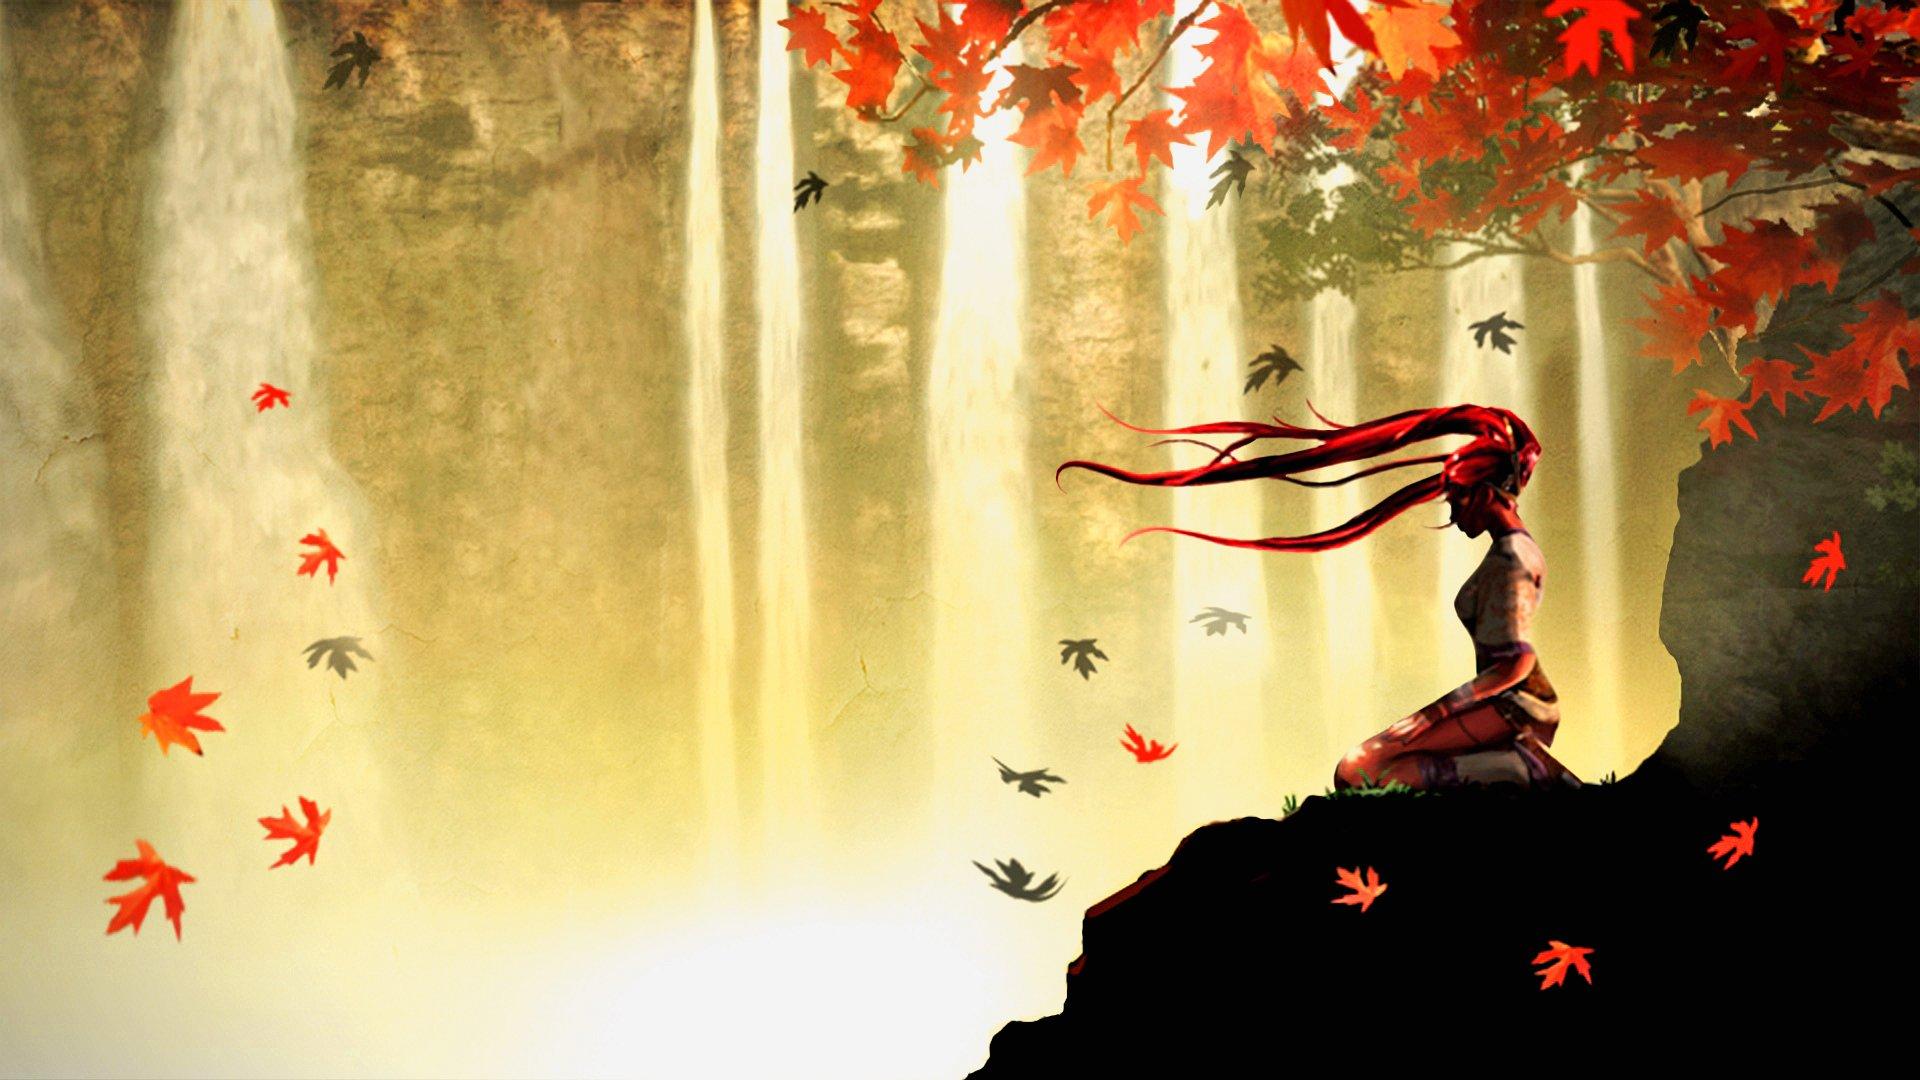 Fall Anime Wallpaper